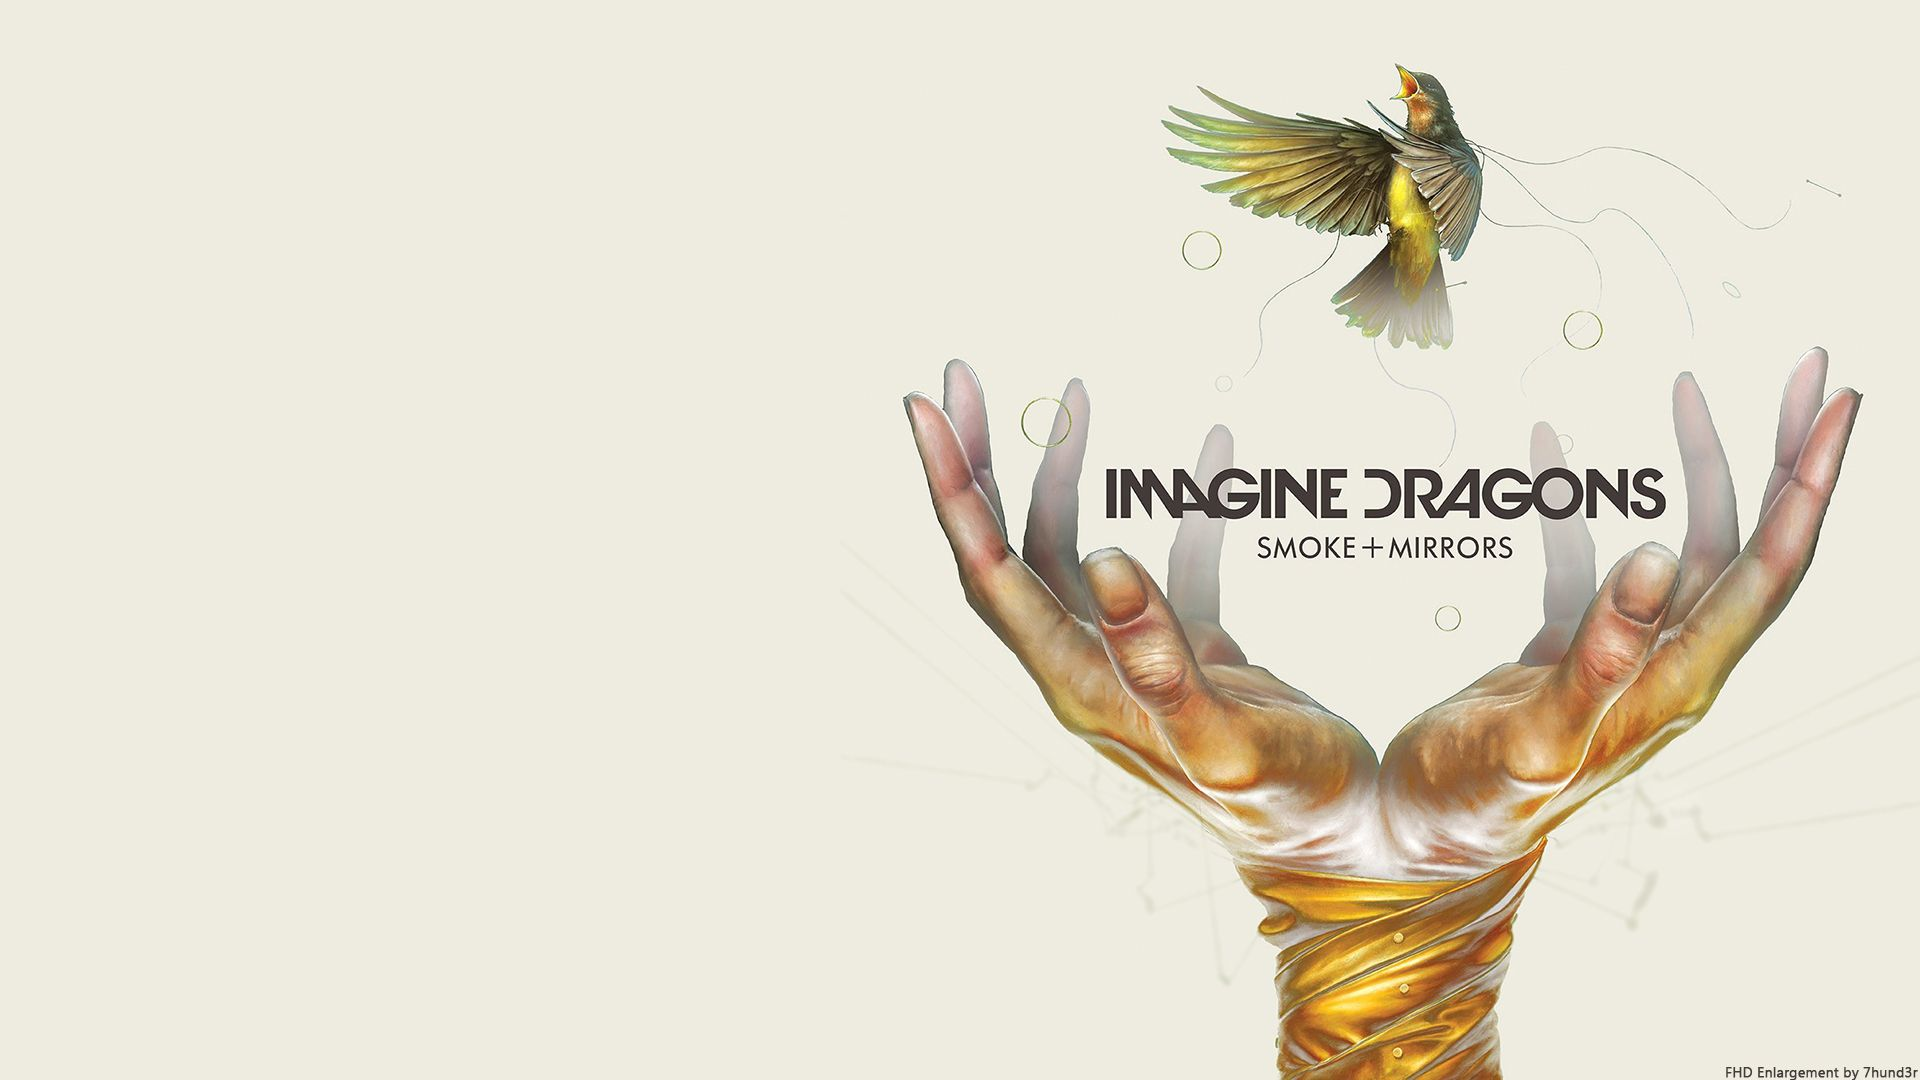 2019 year for women- Inspiration: Album Imagine Dragons Smoke Mirrors